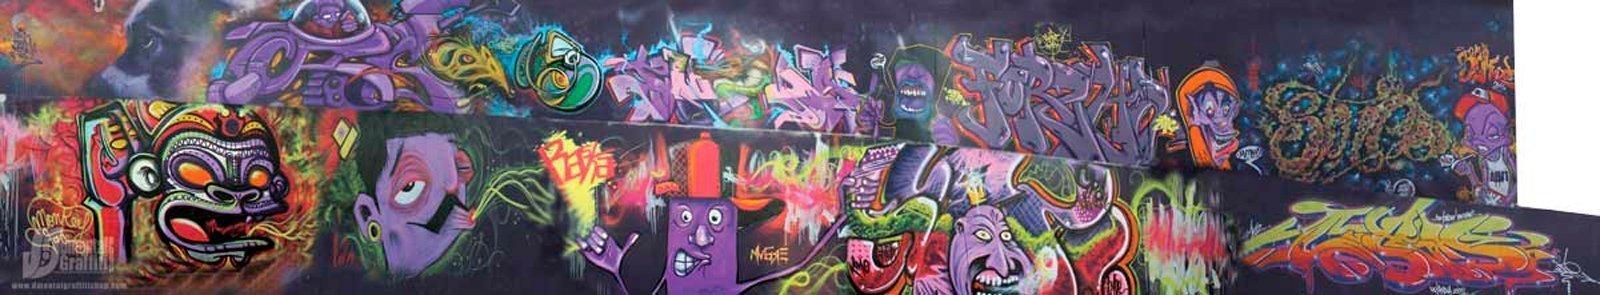 3-TCM-2011-COPACABANA